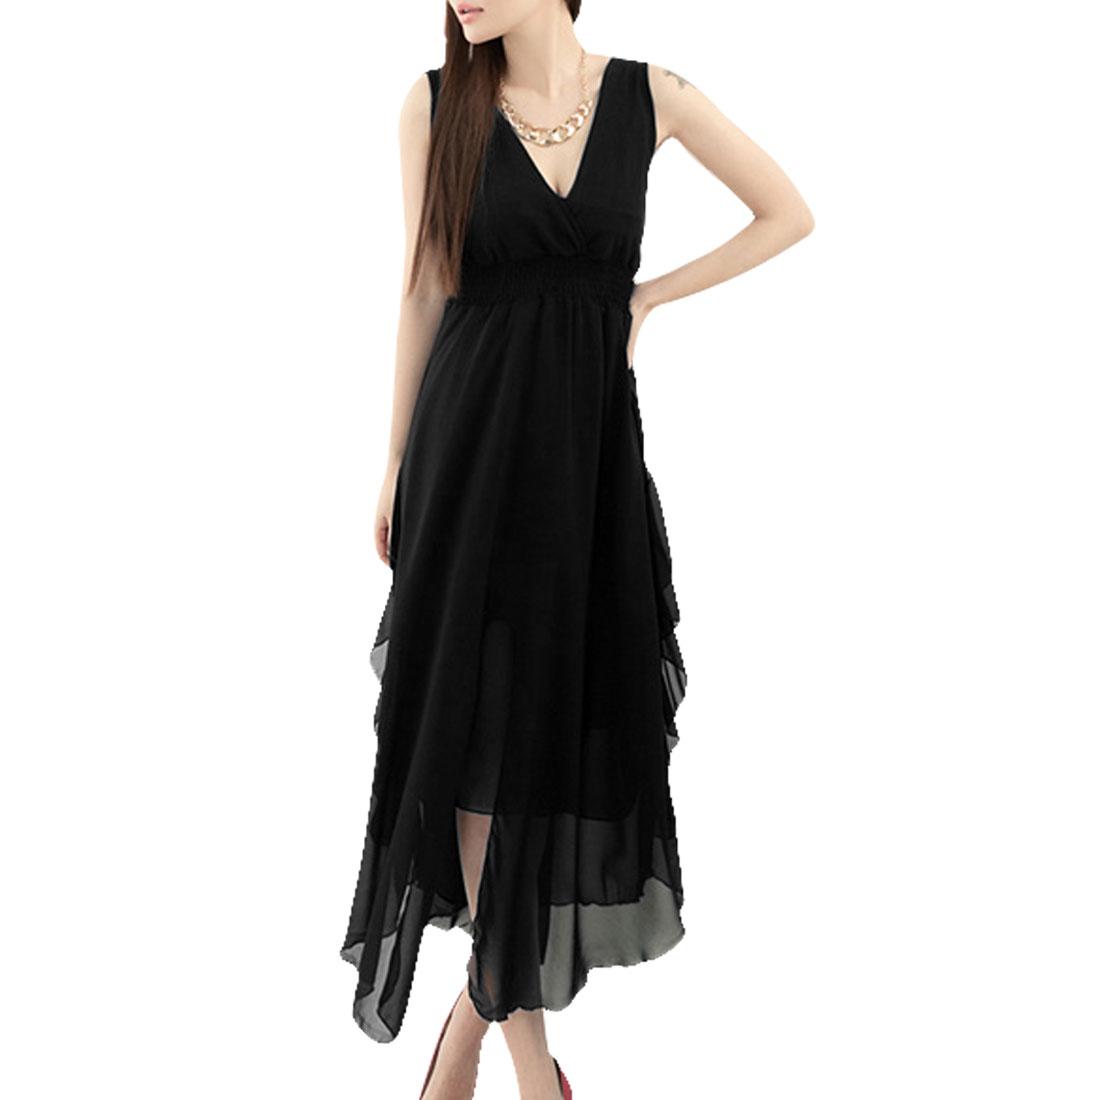 Lining High Waist Summer Casual Empire Tank Dress Black XS for Woman